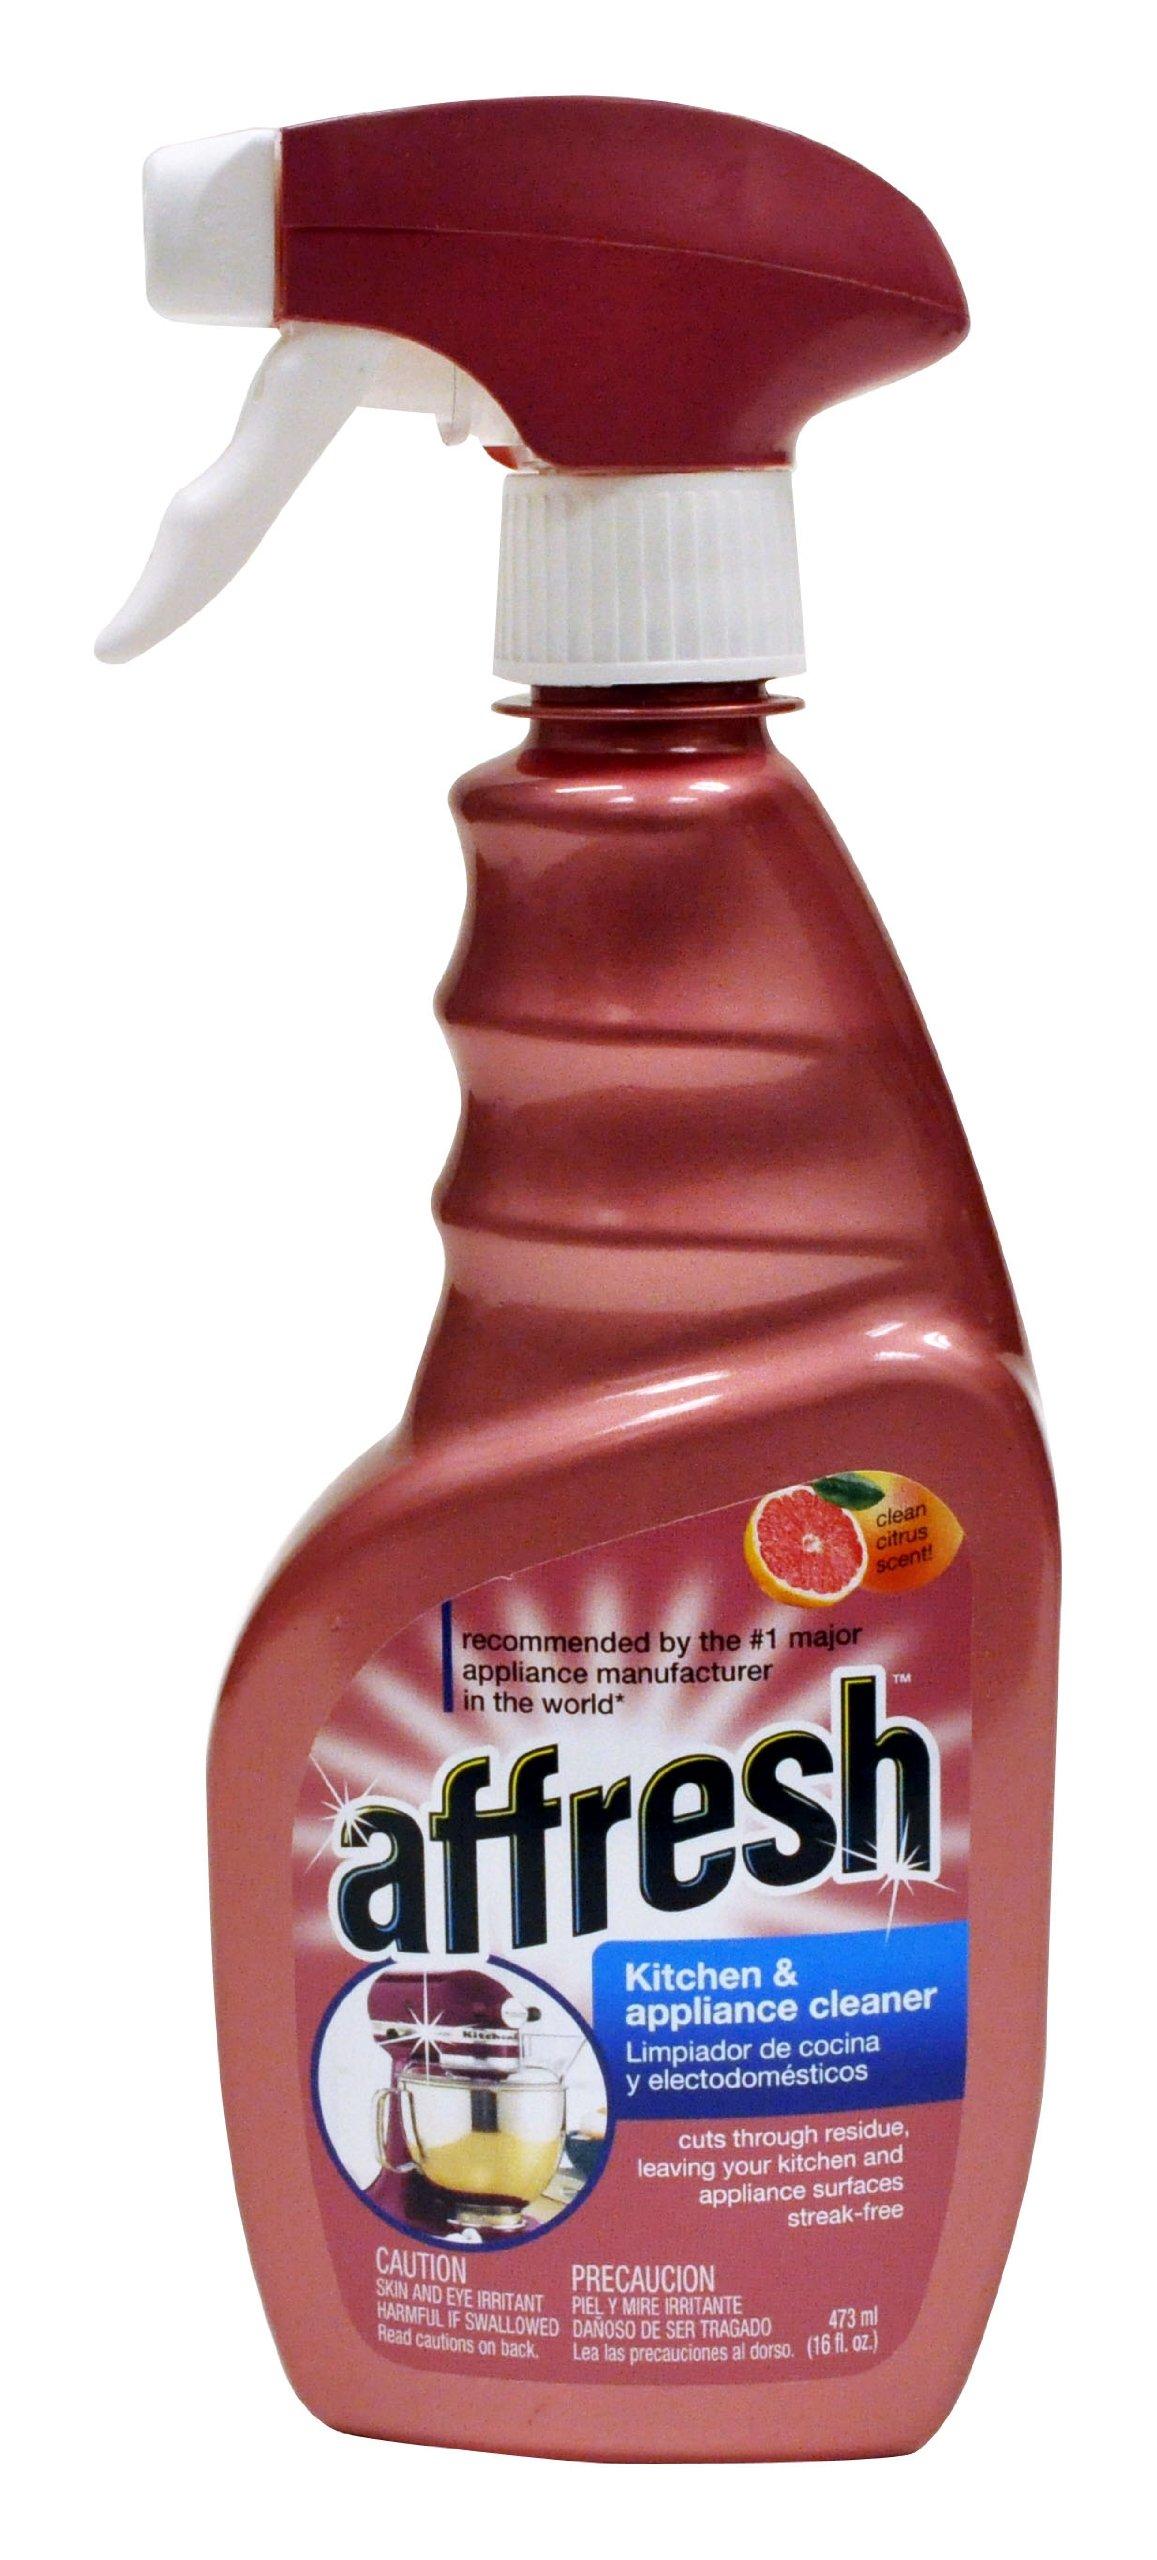 Affresh W10355010 Kitchen and Appliance Cleaner, 16 fl.oz by Affresh (Image #1)